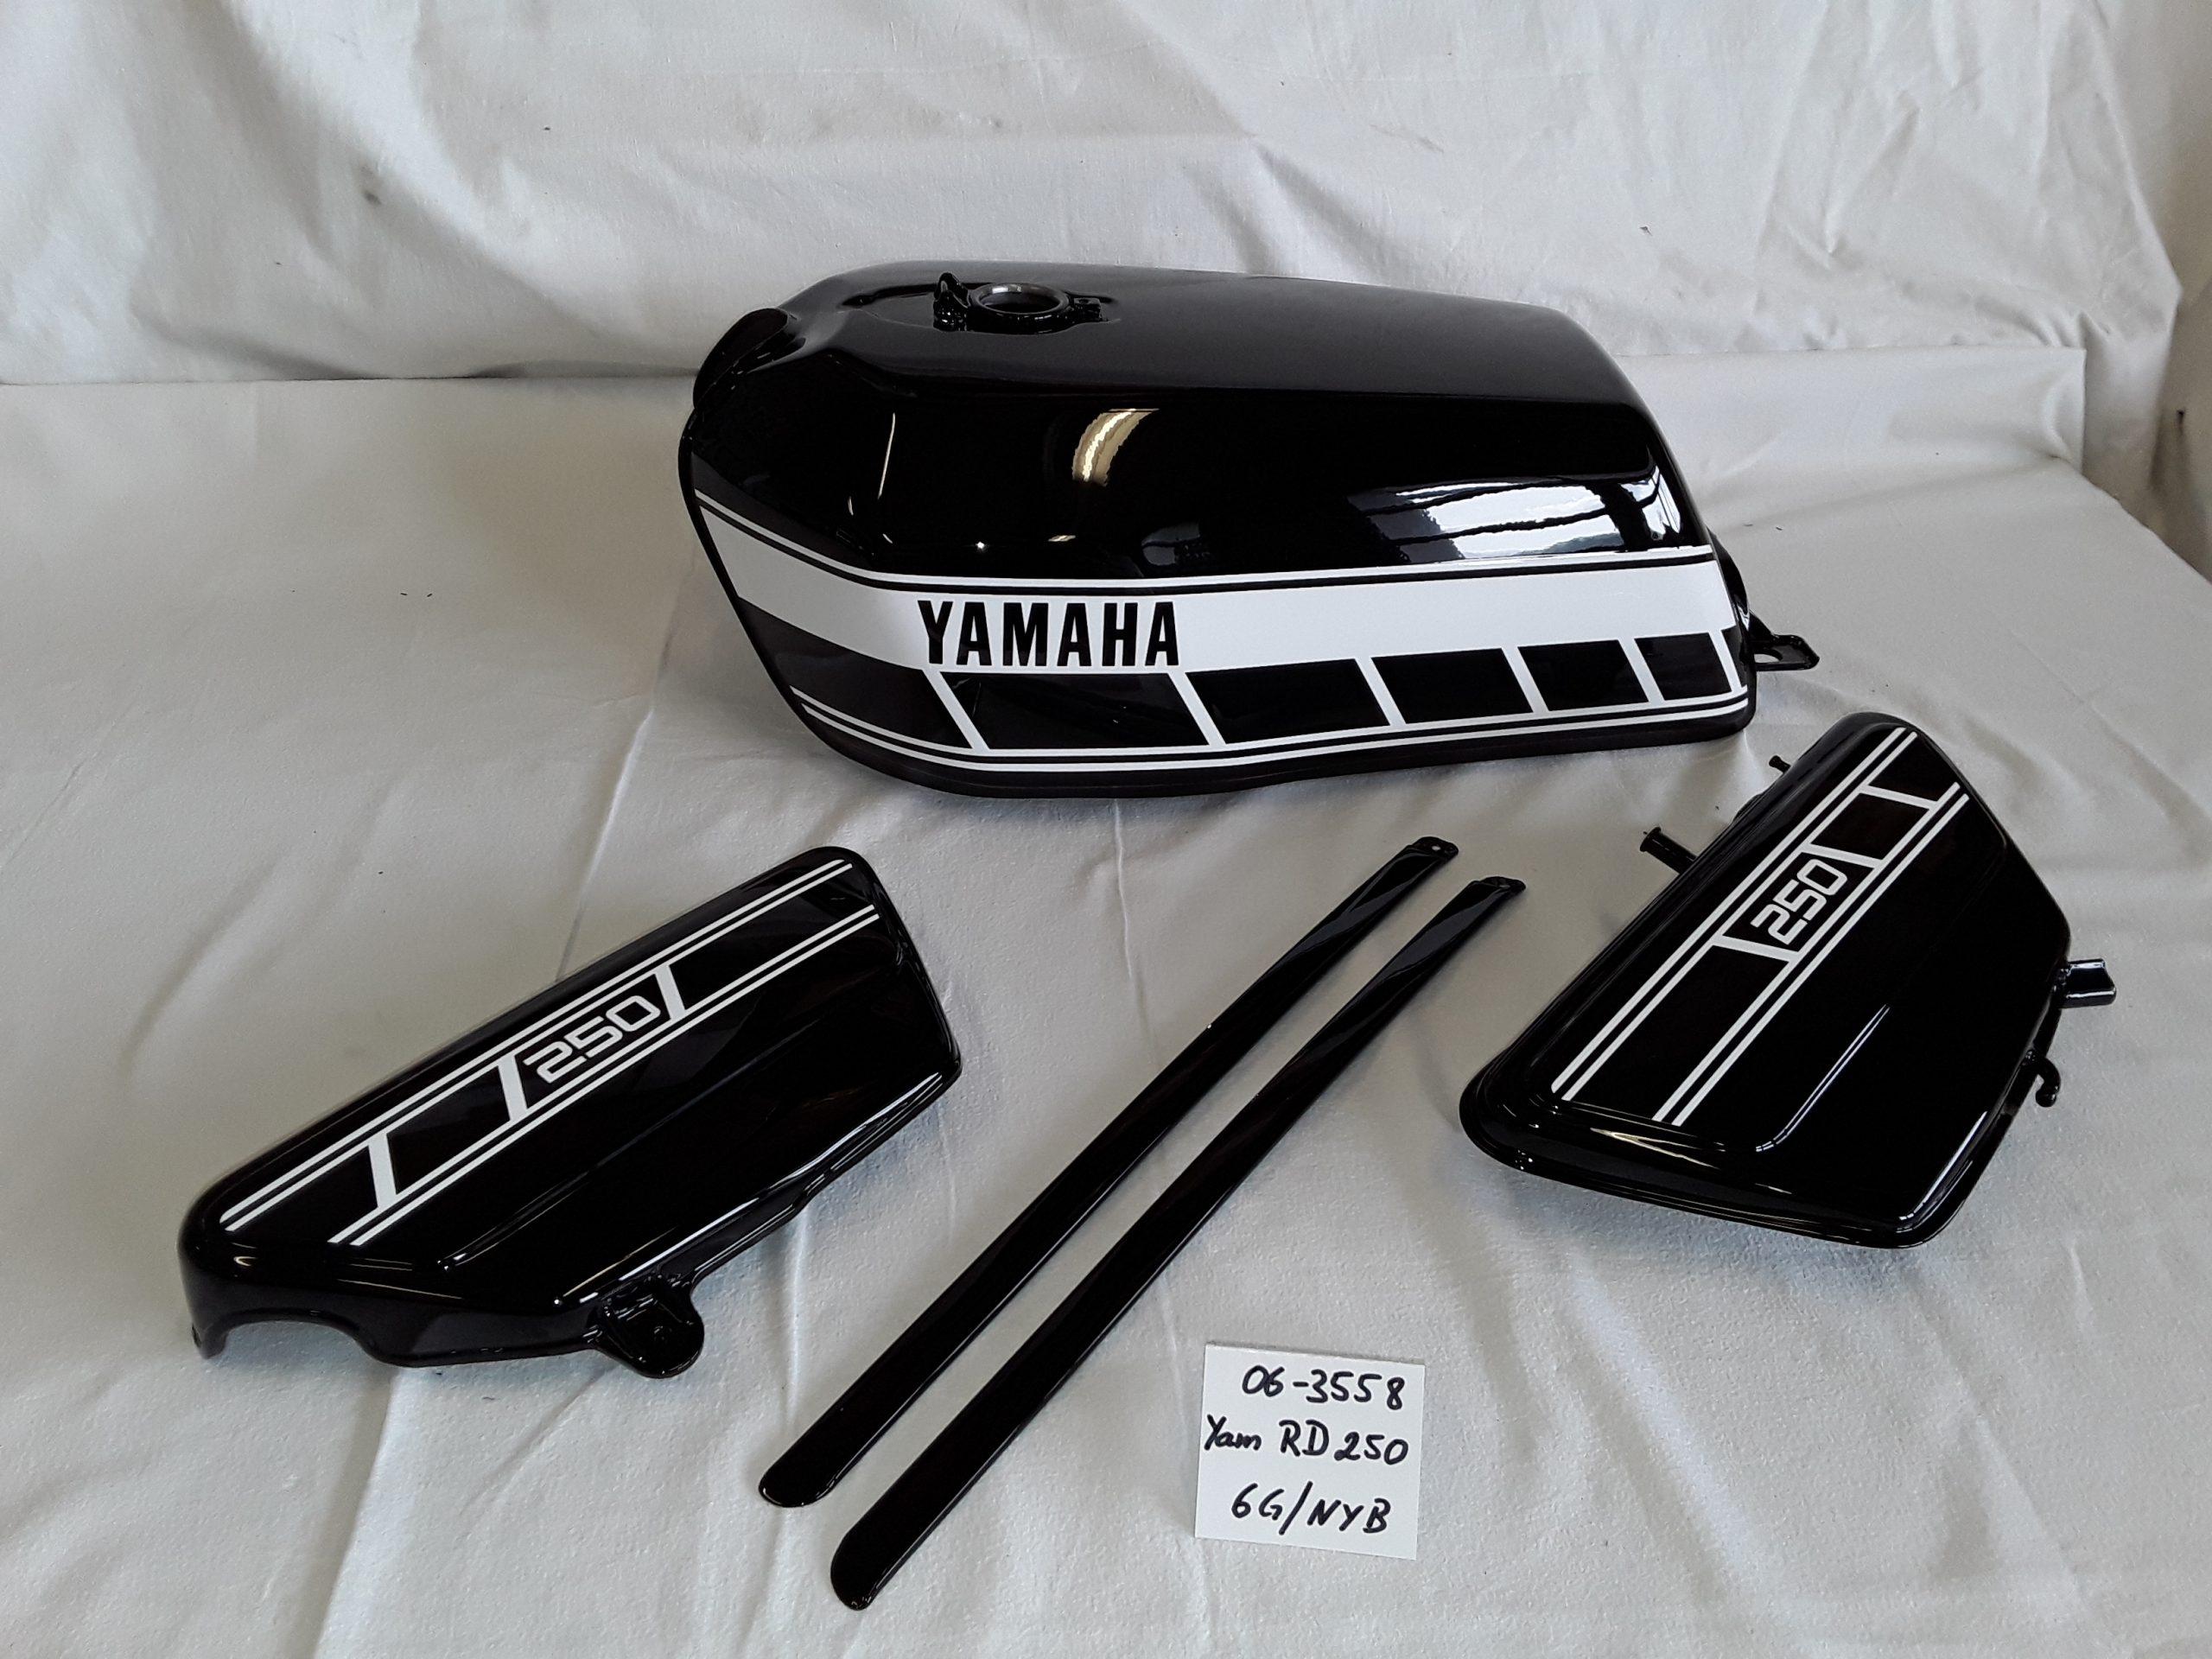 Yamaha RD250 in new yamaha black 6G/NYB RH-Lacke Lackiererei Motorradlackierung 06-3558